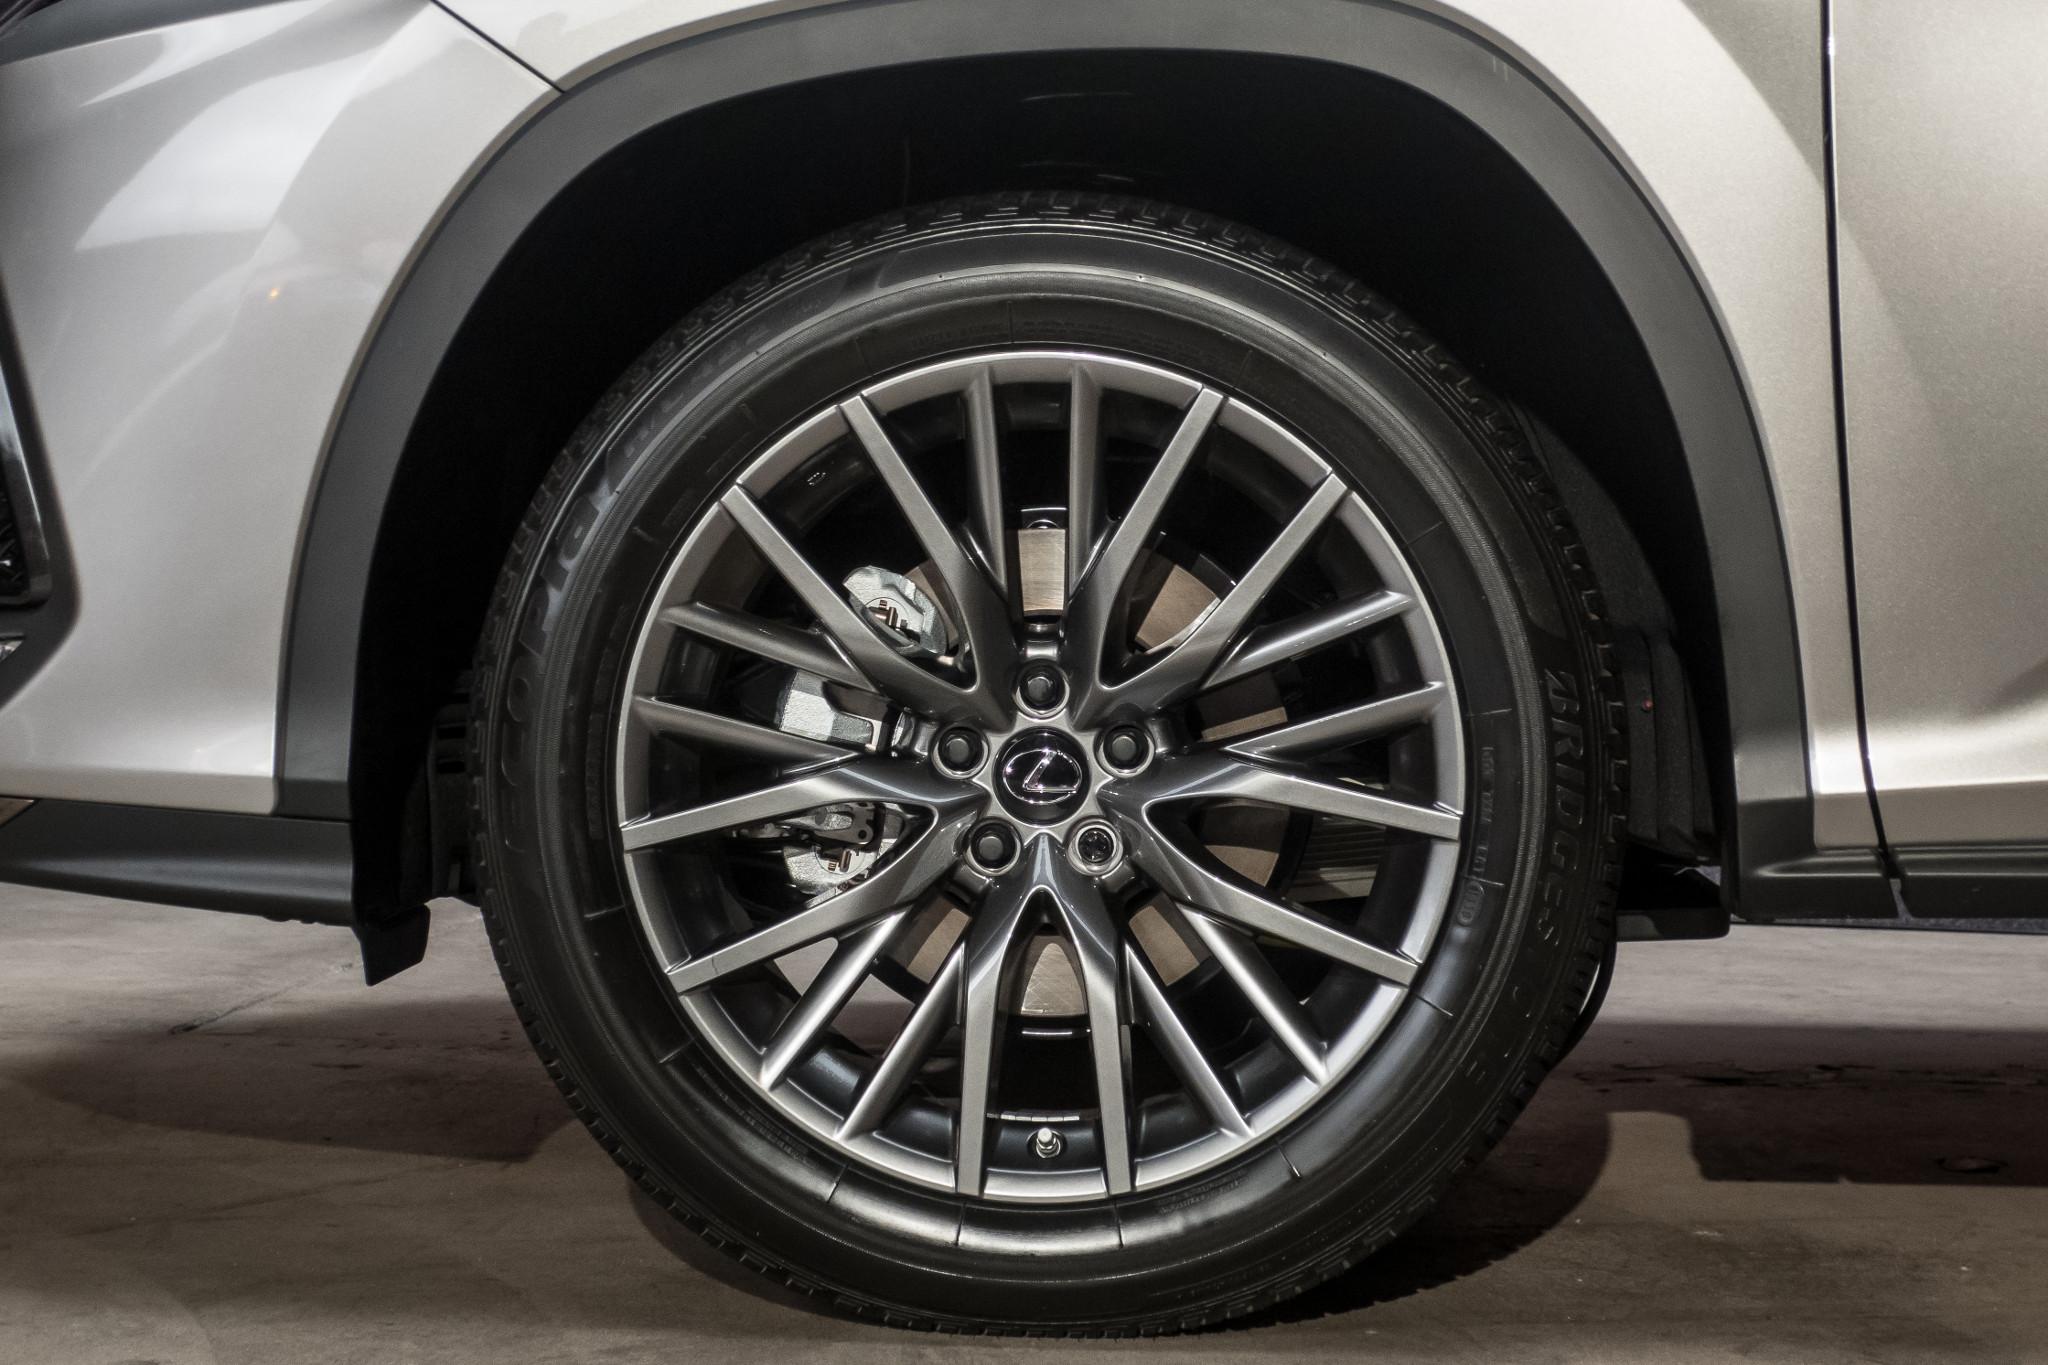 2020 Lexus RX 350 Addresses SUV's Biggest Problem, But Doesn't Fix